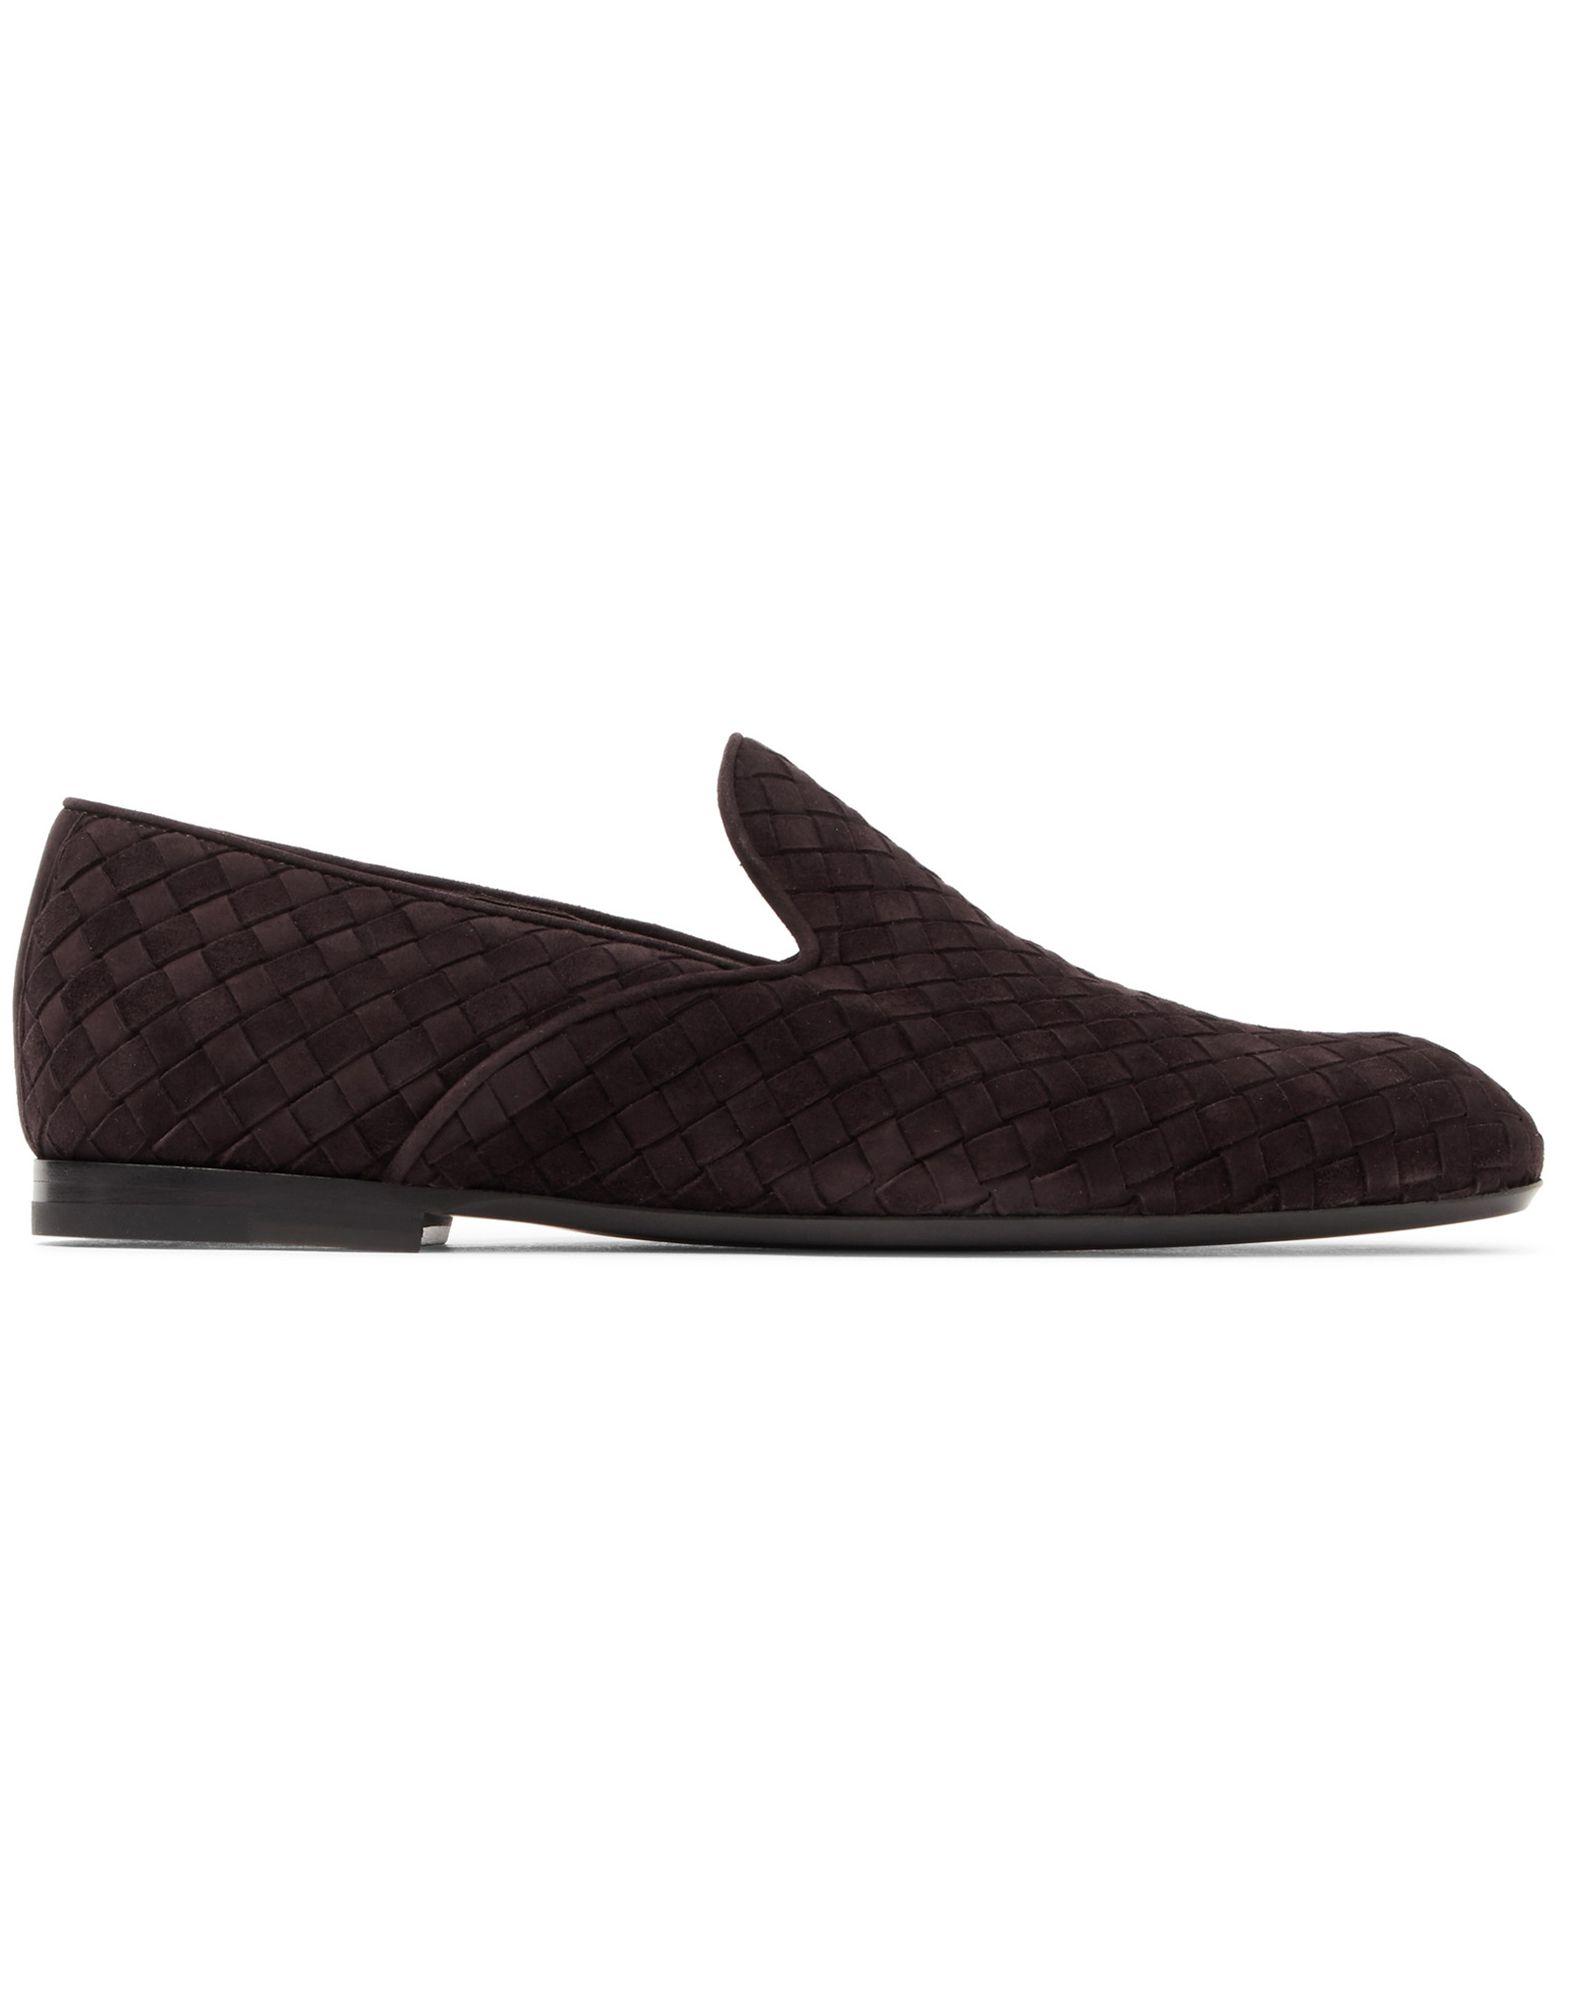 Bottega Veneta Mokassins Herren  11539567MB Gute Qualität beliebte Schuhe